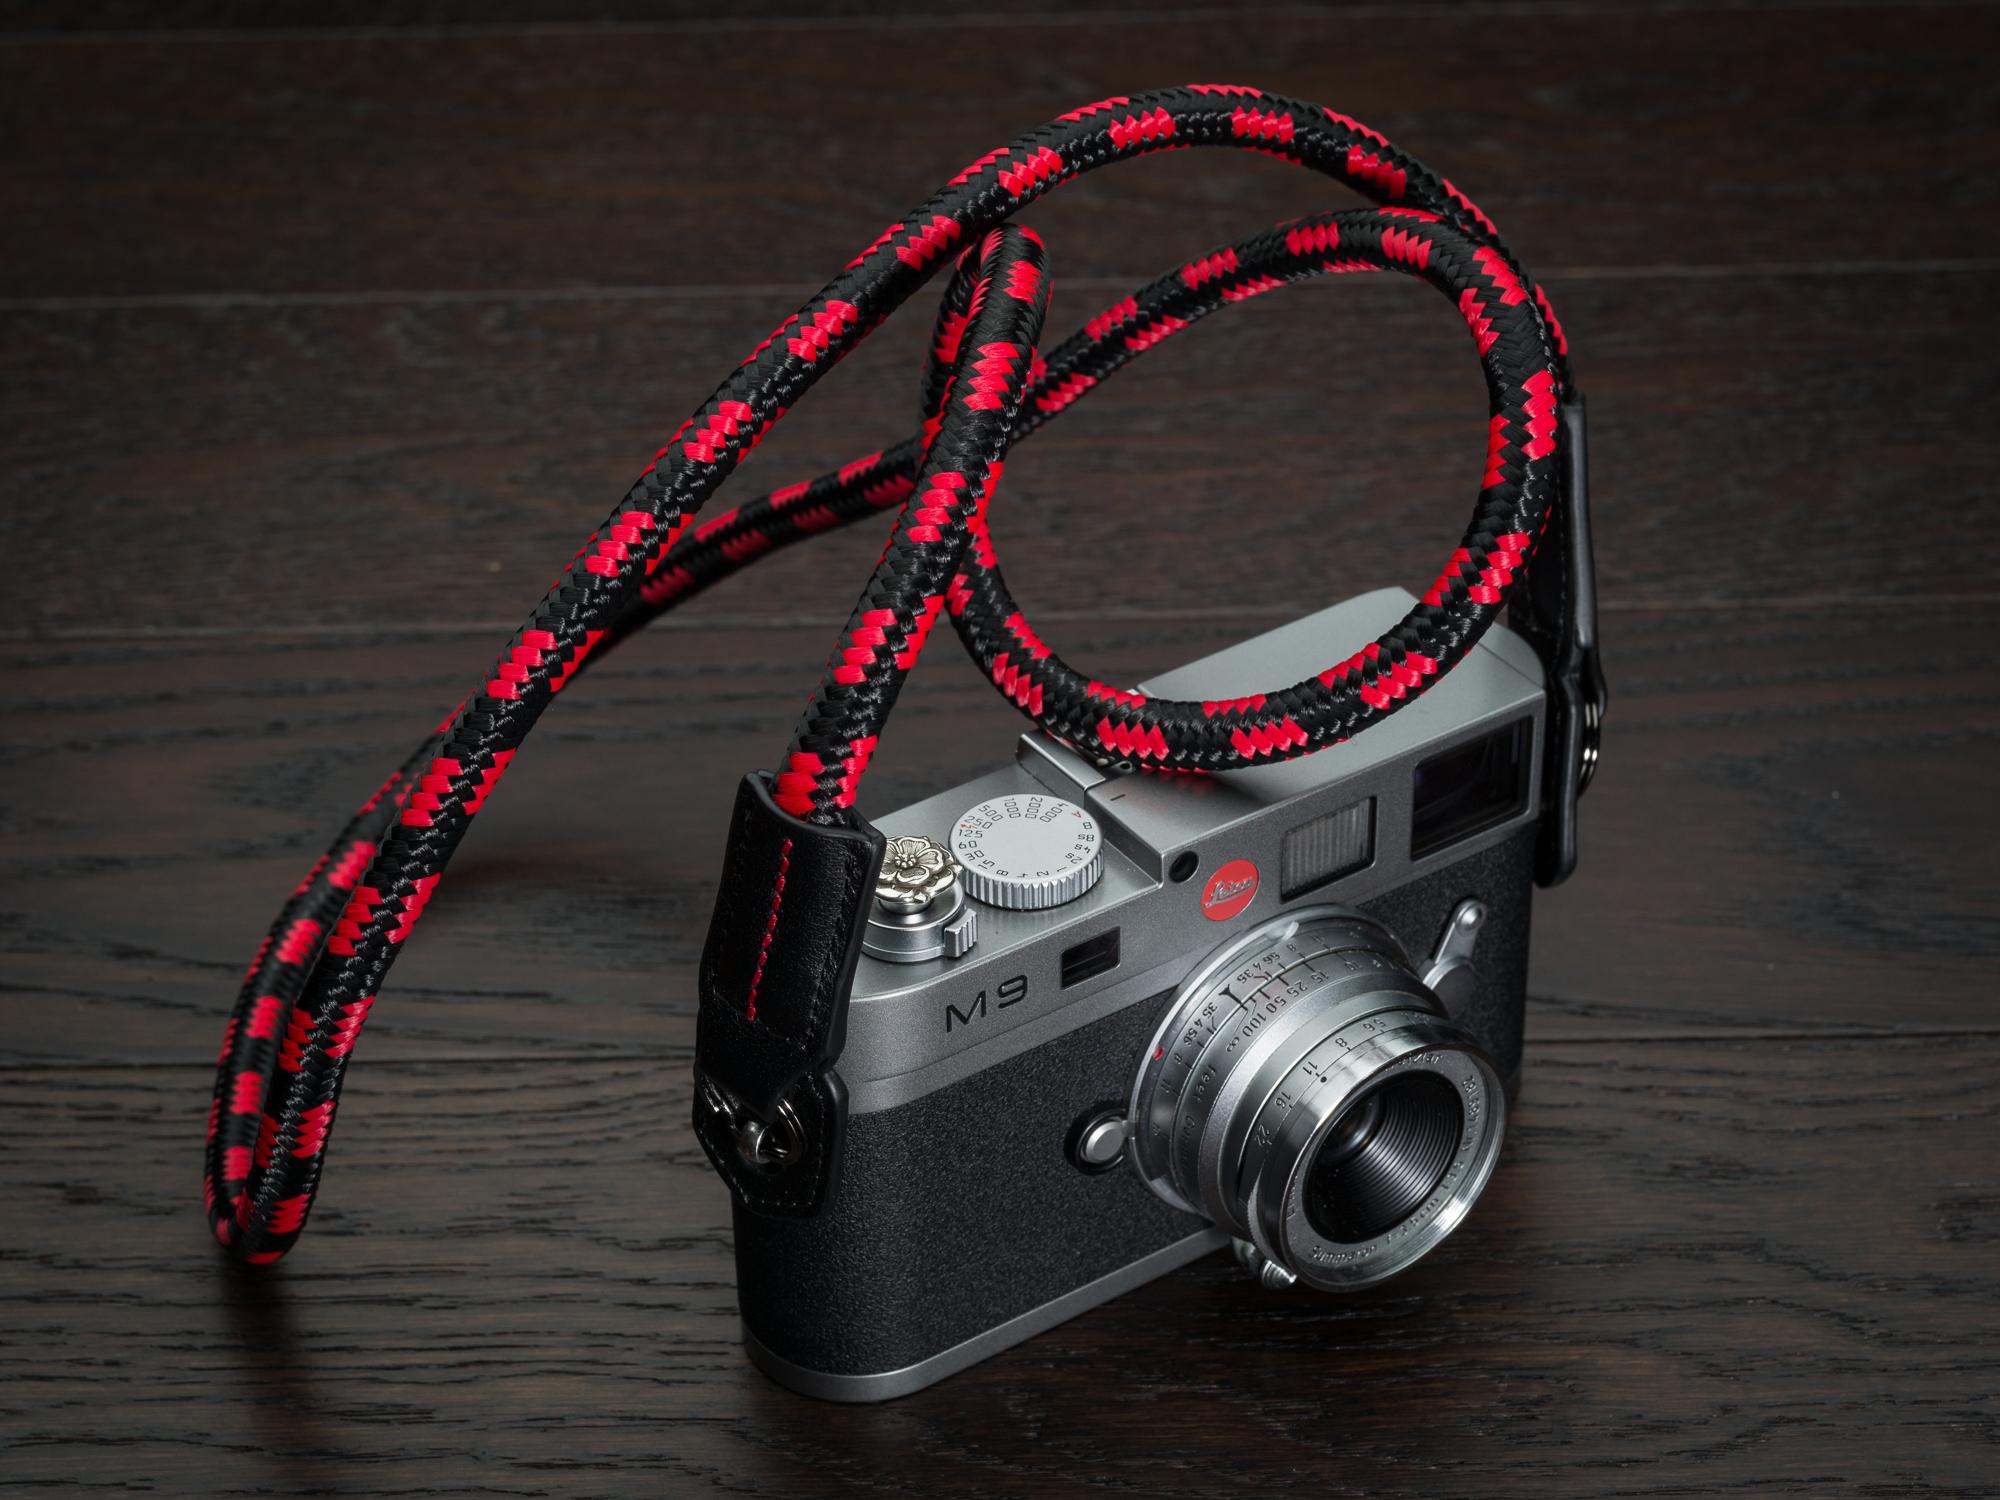 Vi vante Cliff Hanger Rope Strap Camera Strap Leica M9 6.jpg